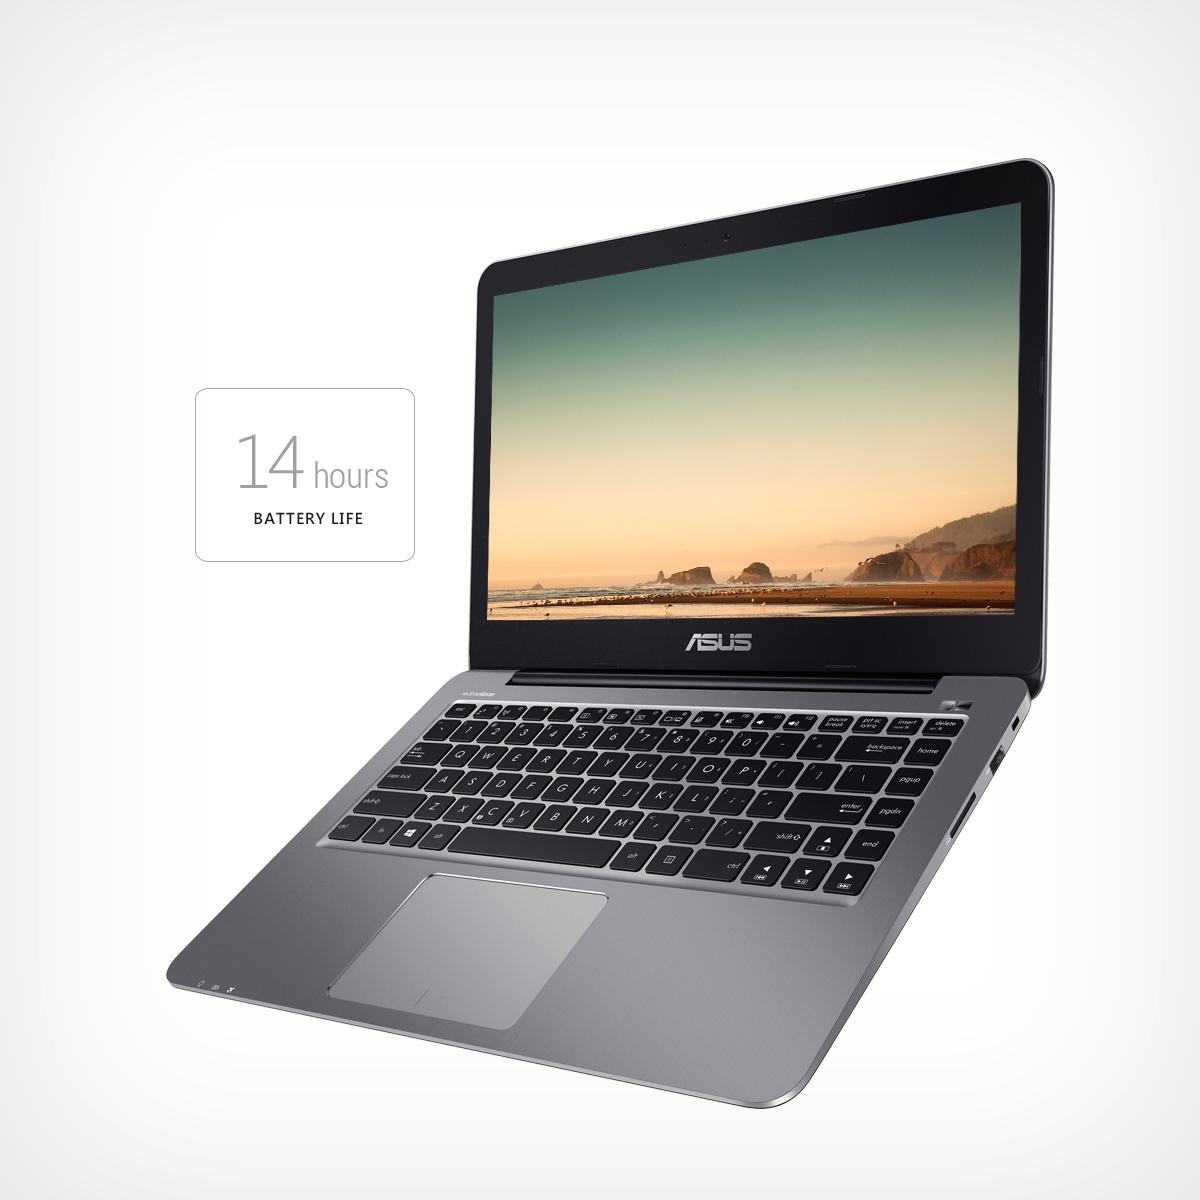 asus vivobook e403sa us21 14 inch full hd laptop intel quad core n3700 processor 4. Black Bedroom Furniture Sets. Home Design Ideas